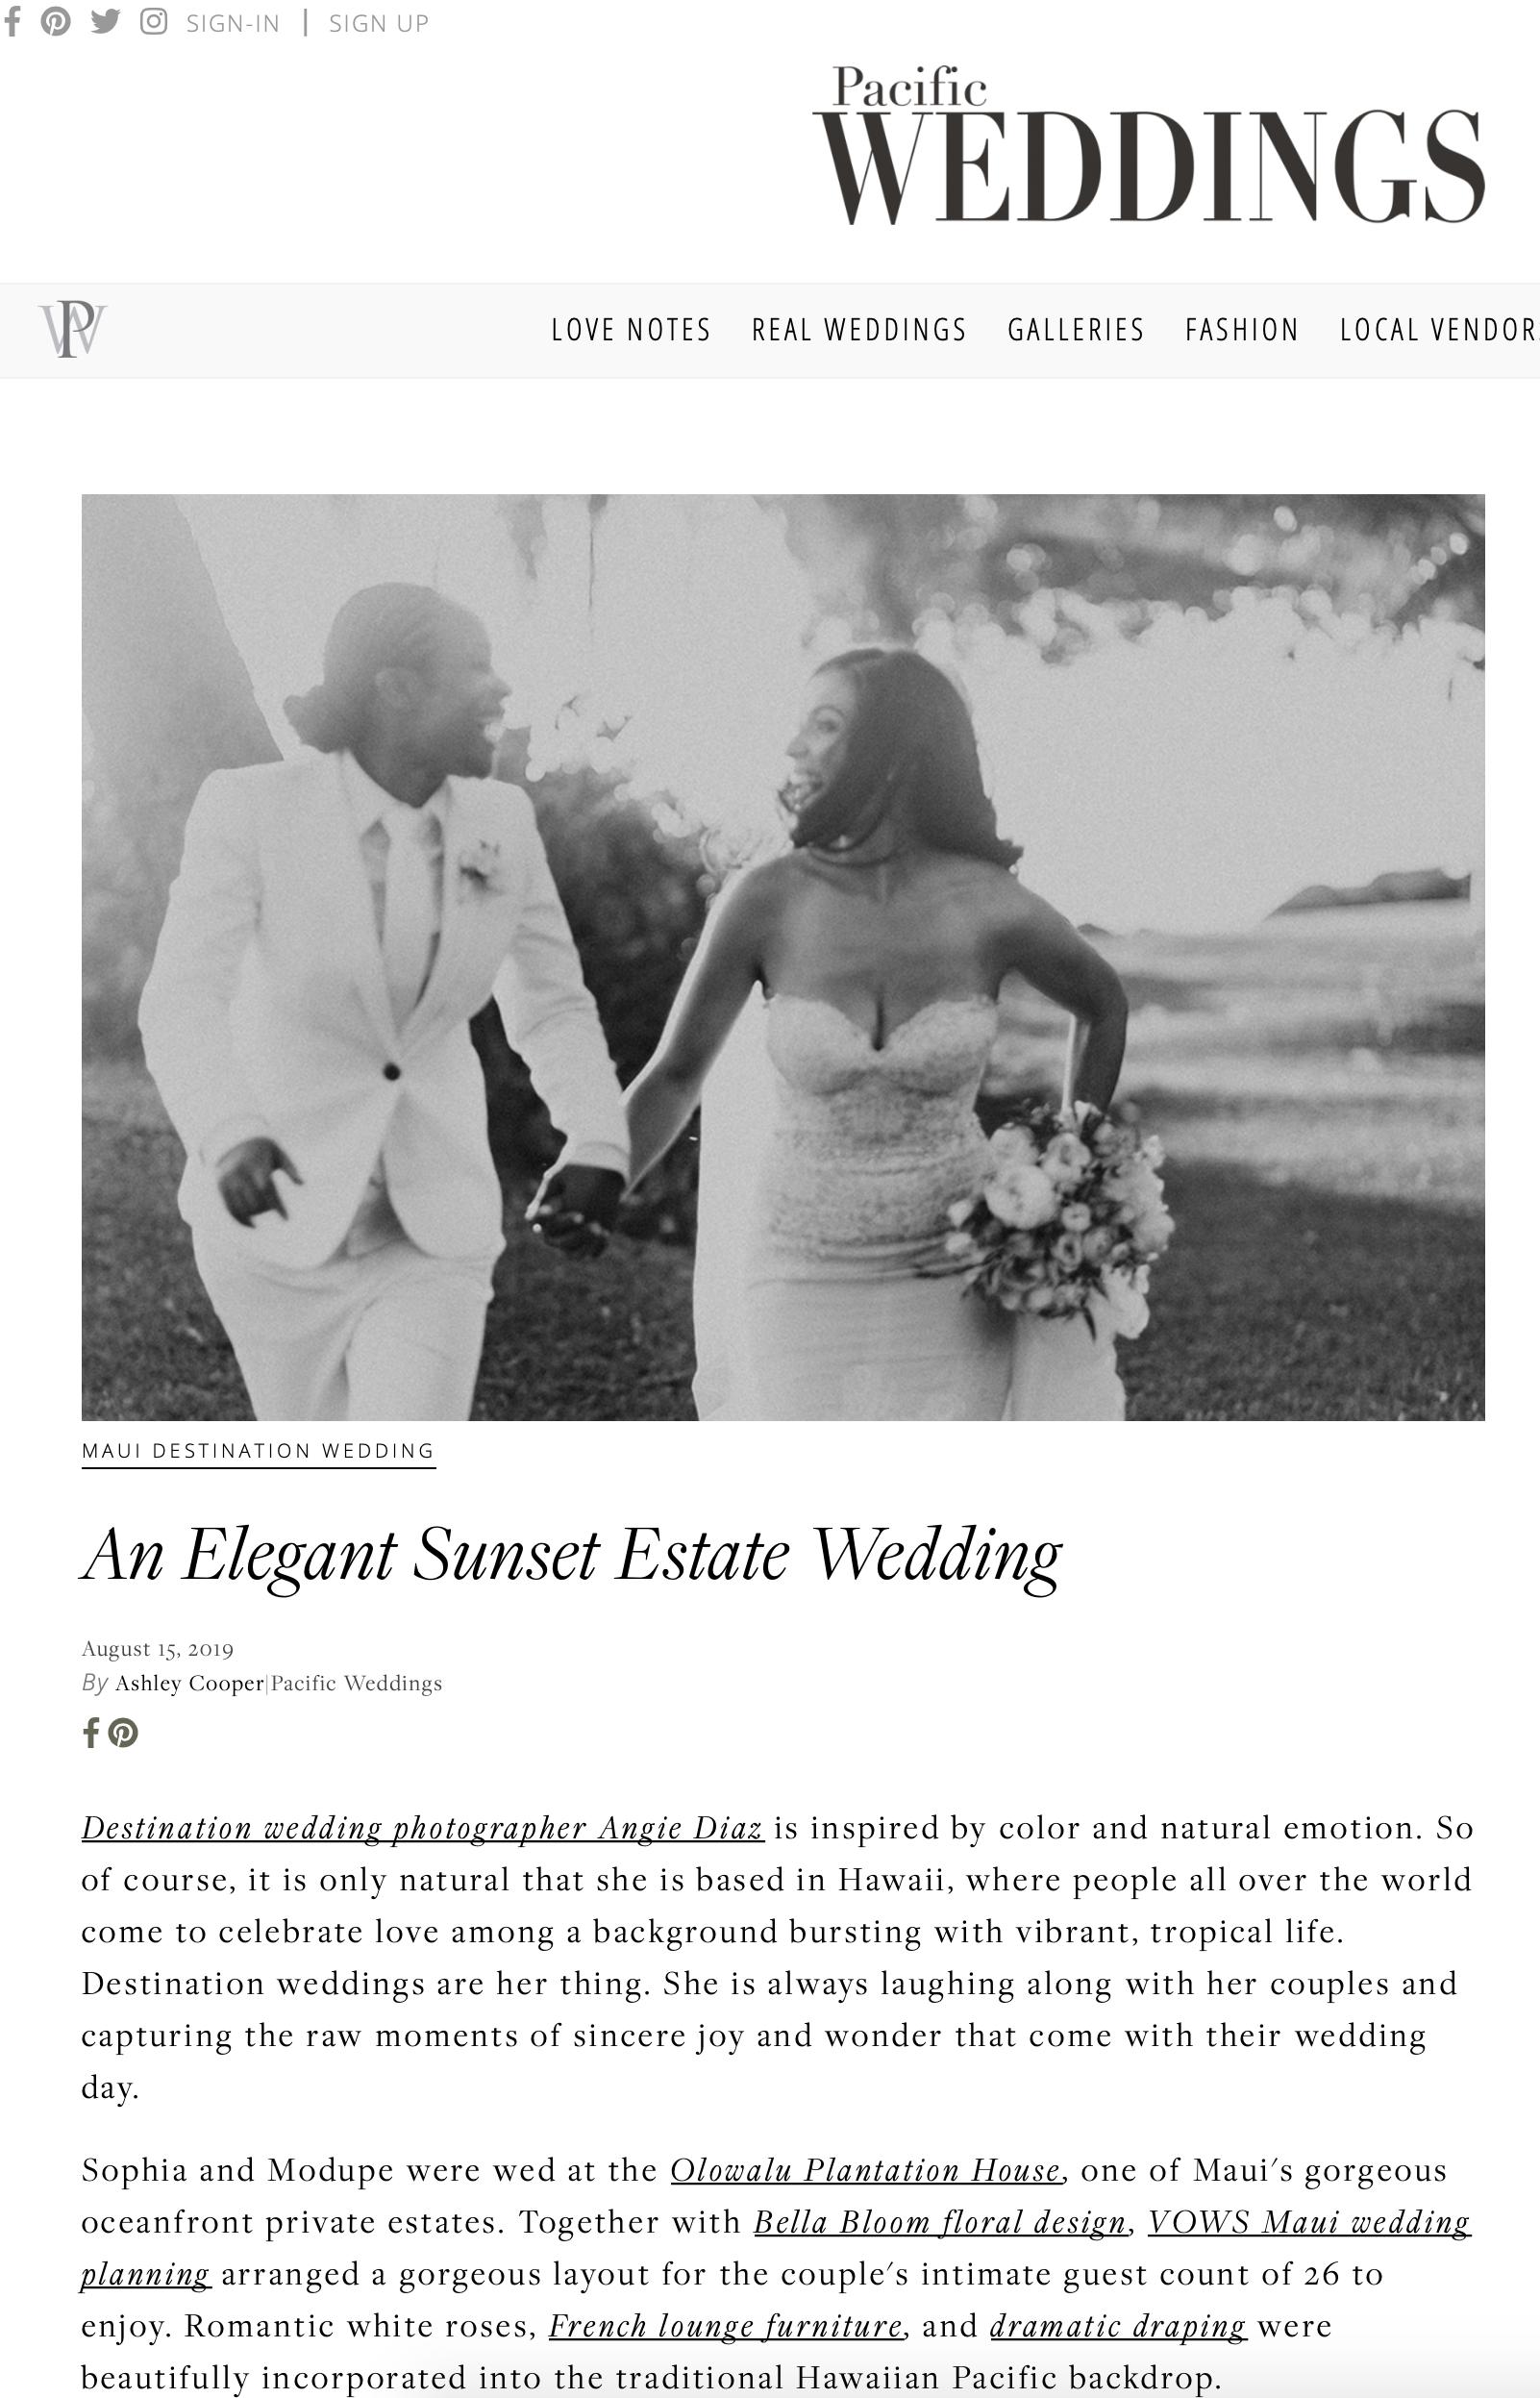 olowalu plantation house wedding.png